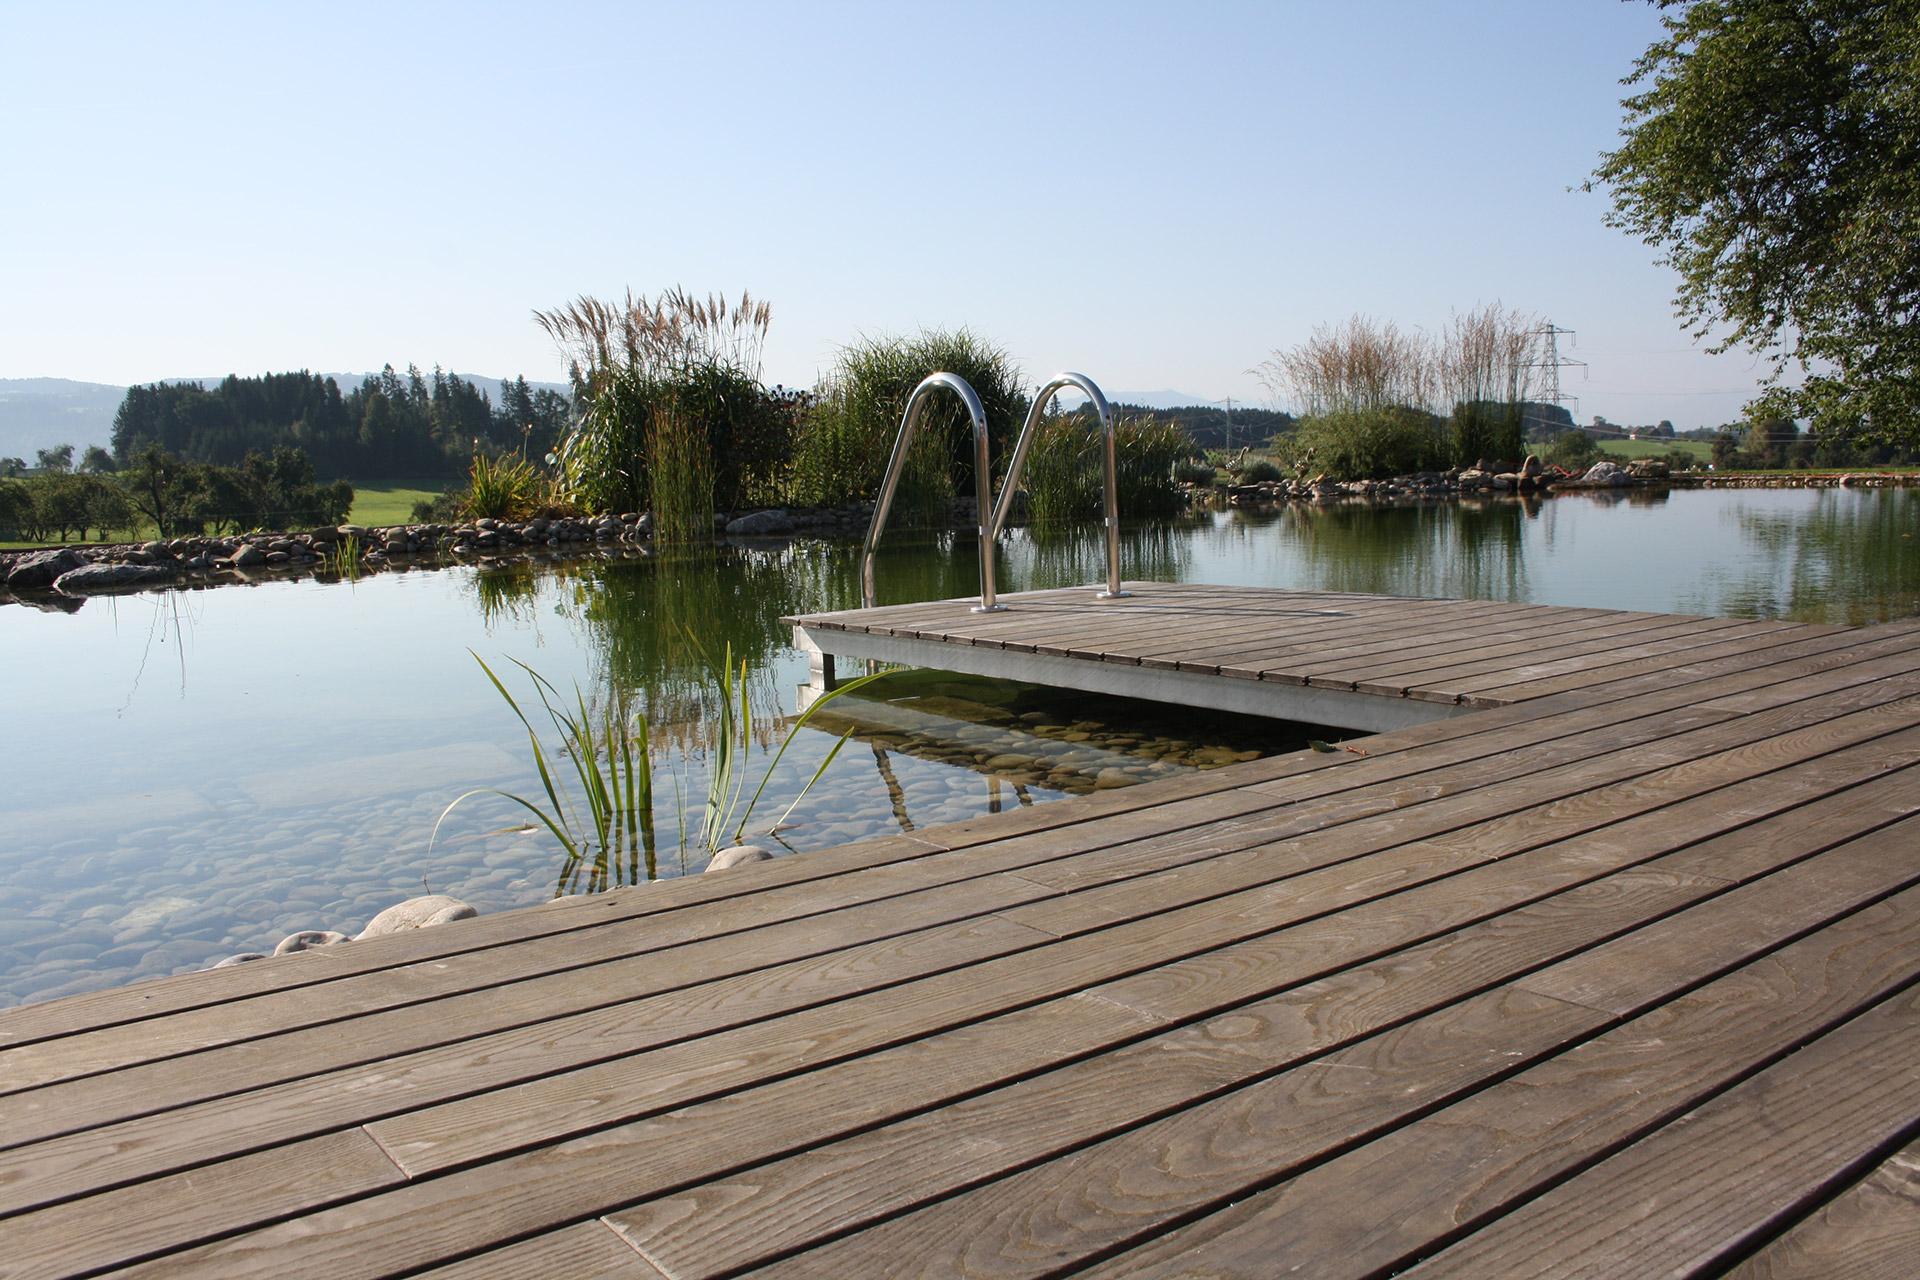 Seca Referenz Terrasse Teich Serafin Campestrini Gmbh Ihr